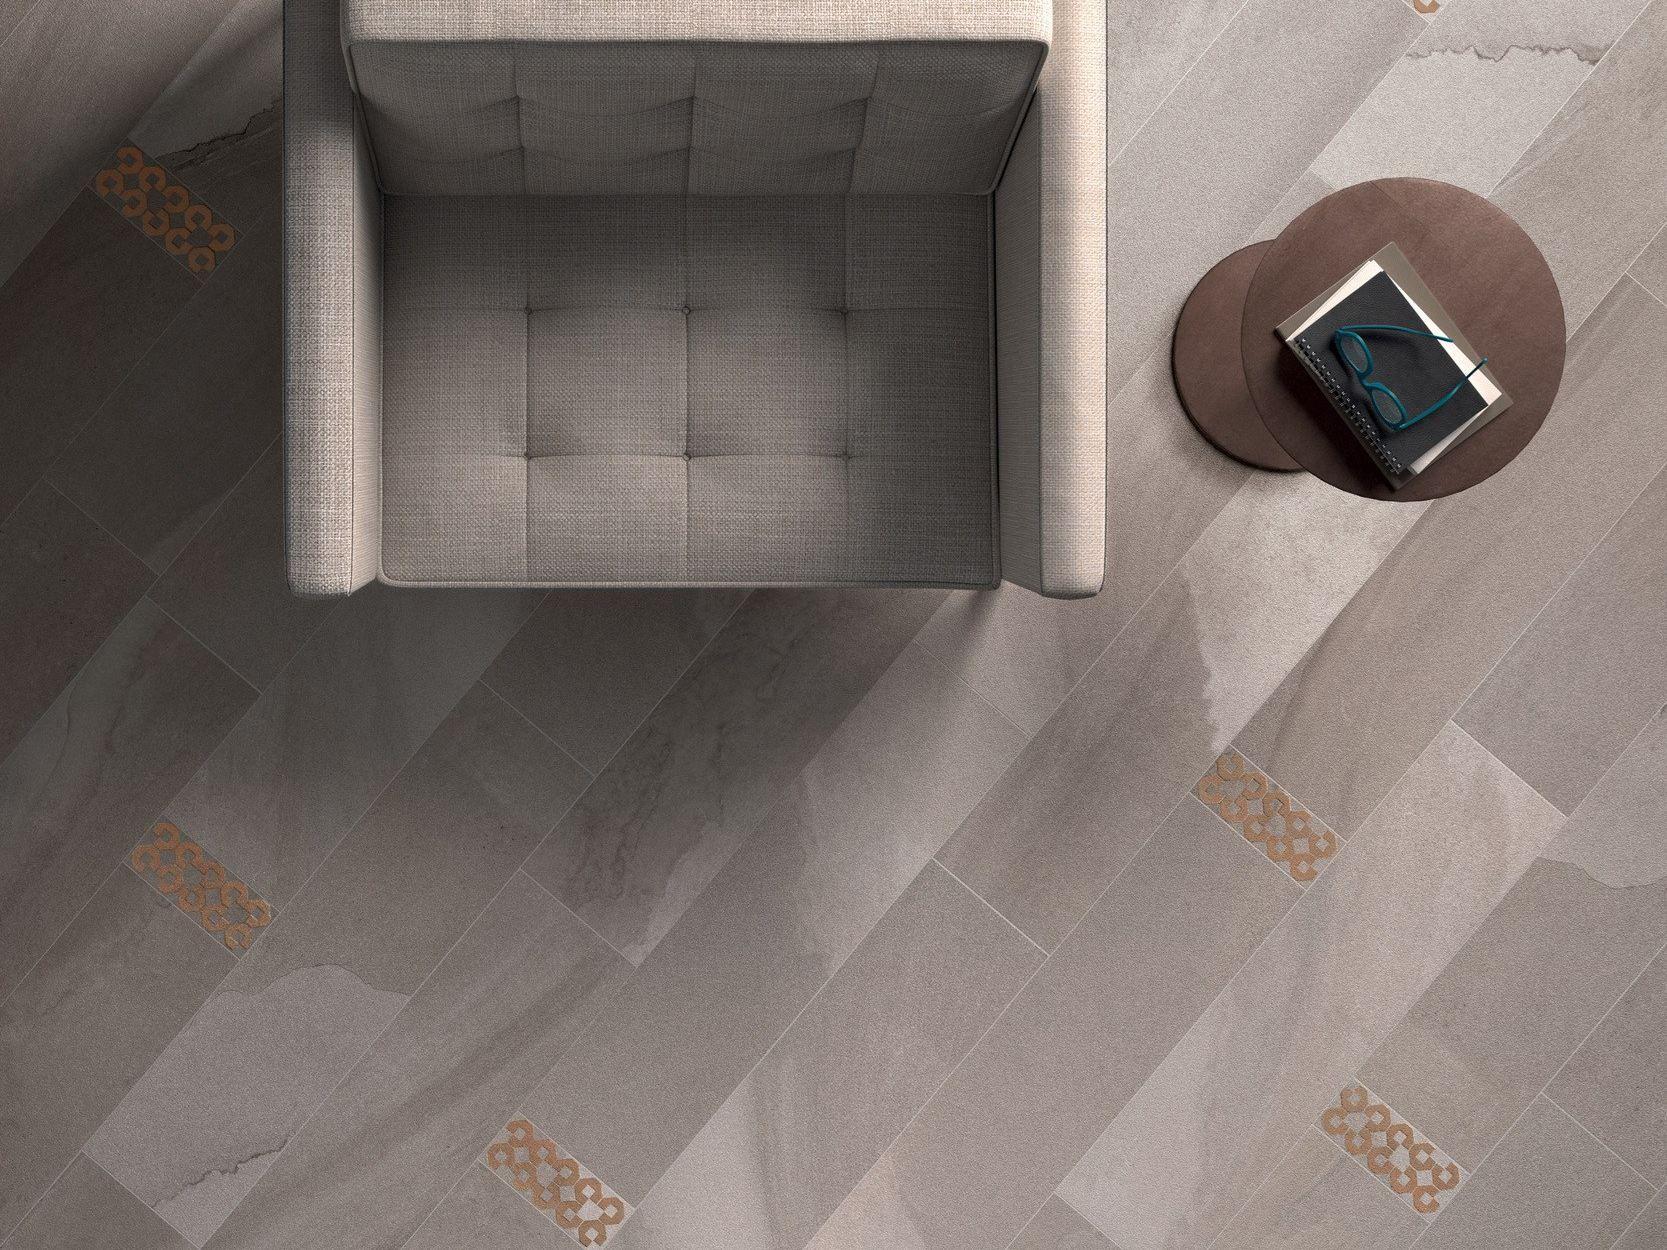 rev tement de sol mur en gr s c rame fluido by ariana ceramica italiana. Black Bedroom Furniture Sets. Home Design Ideas